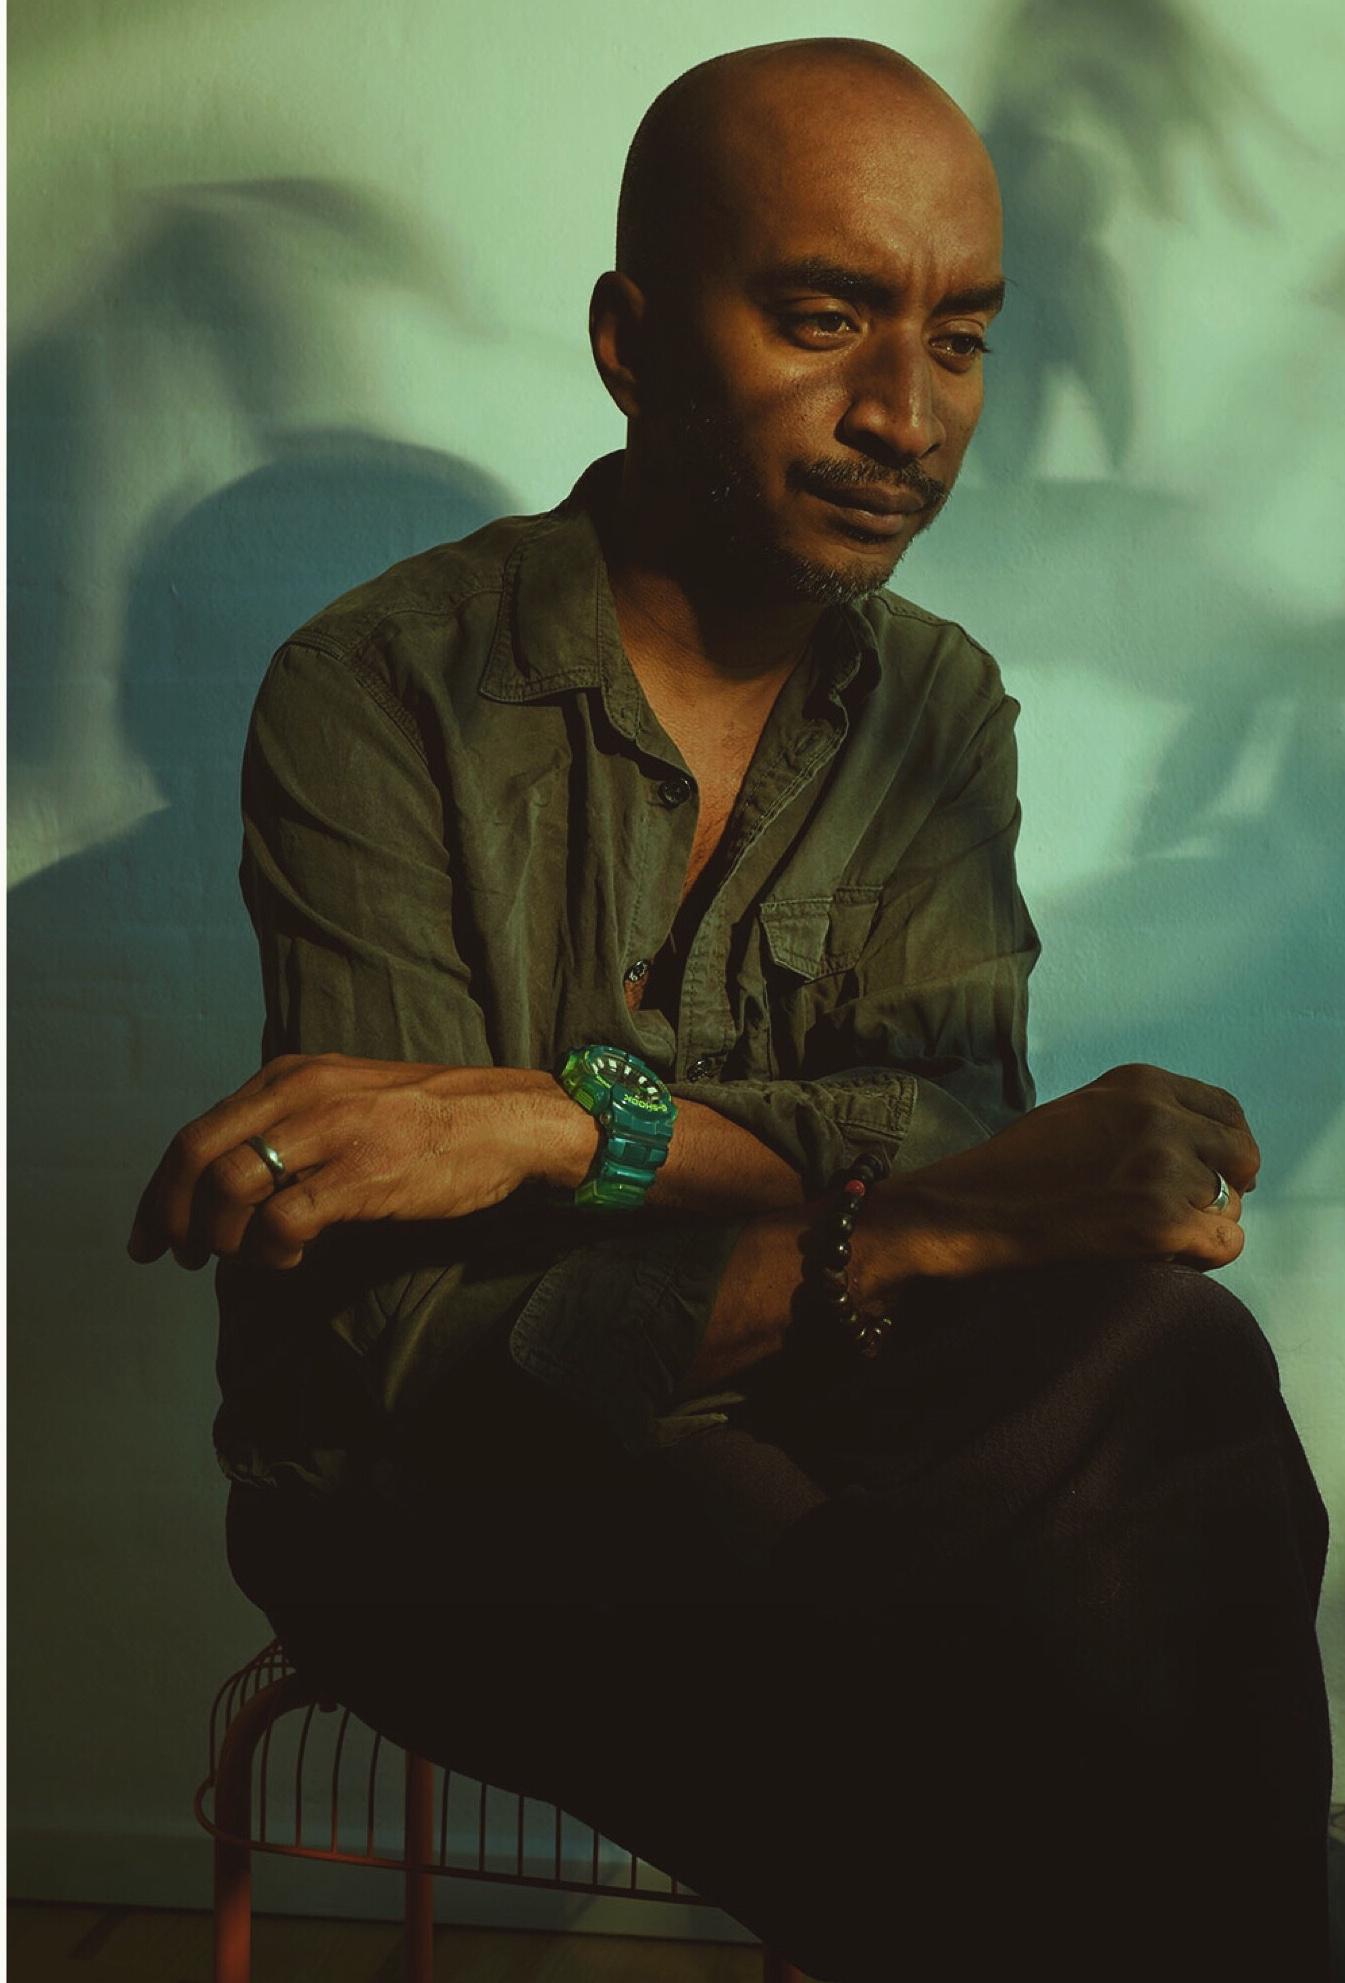 Self portrait of photographer Donald Michael Chambers